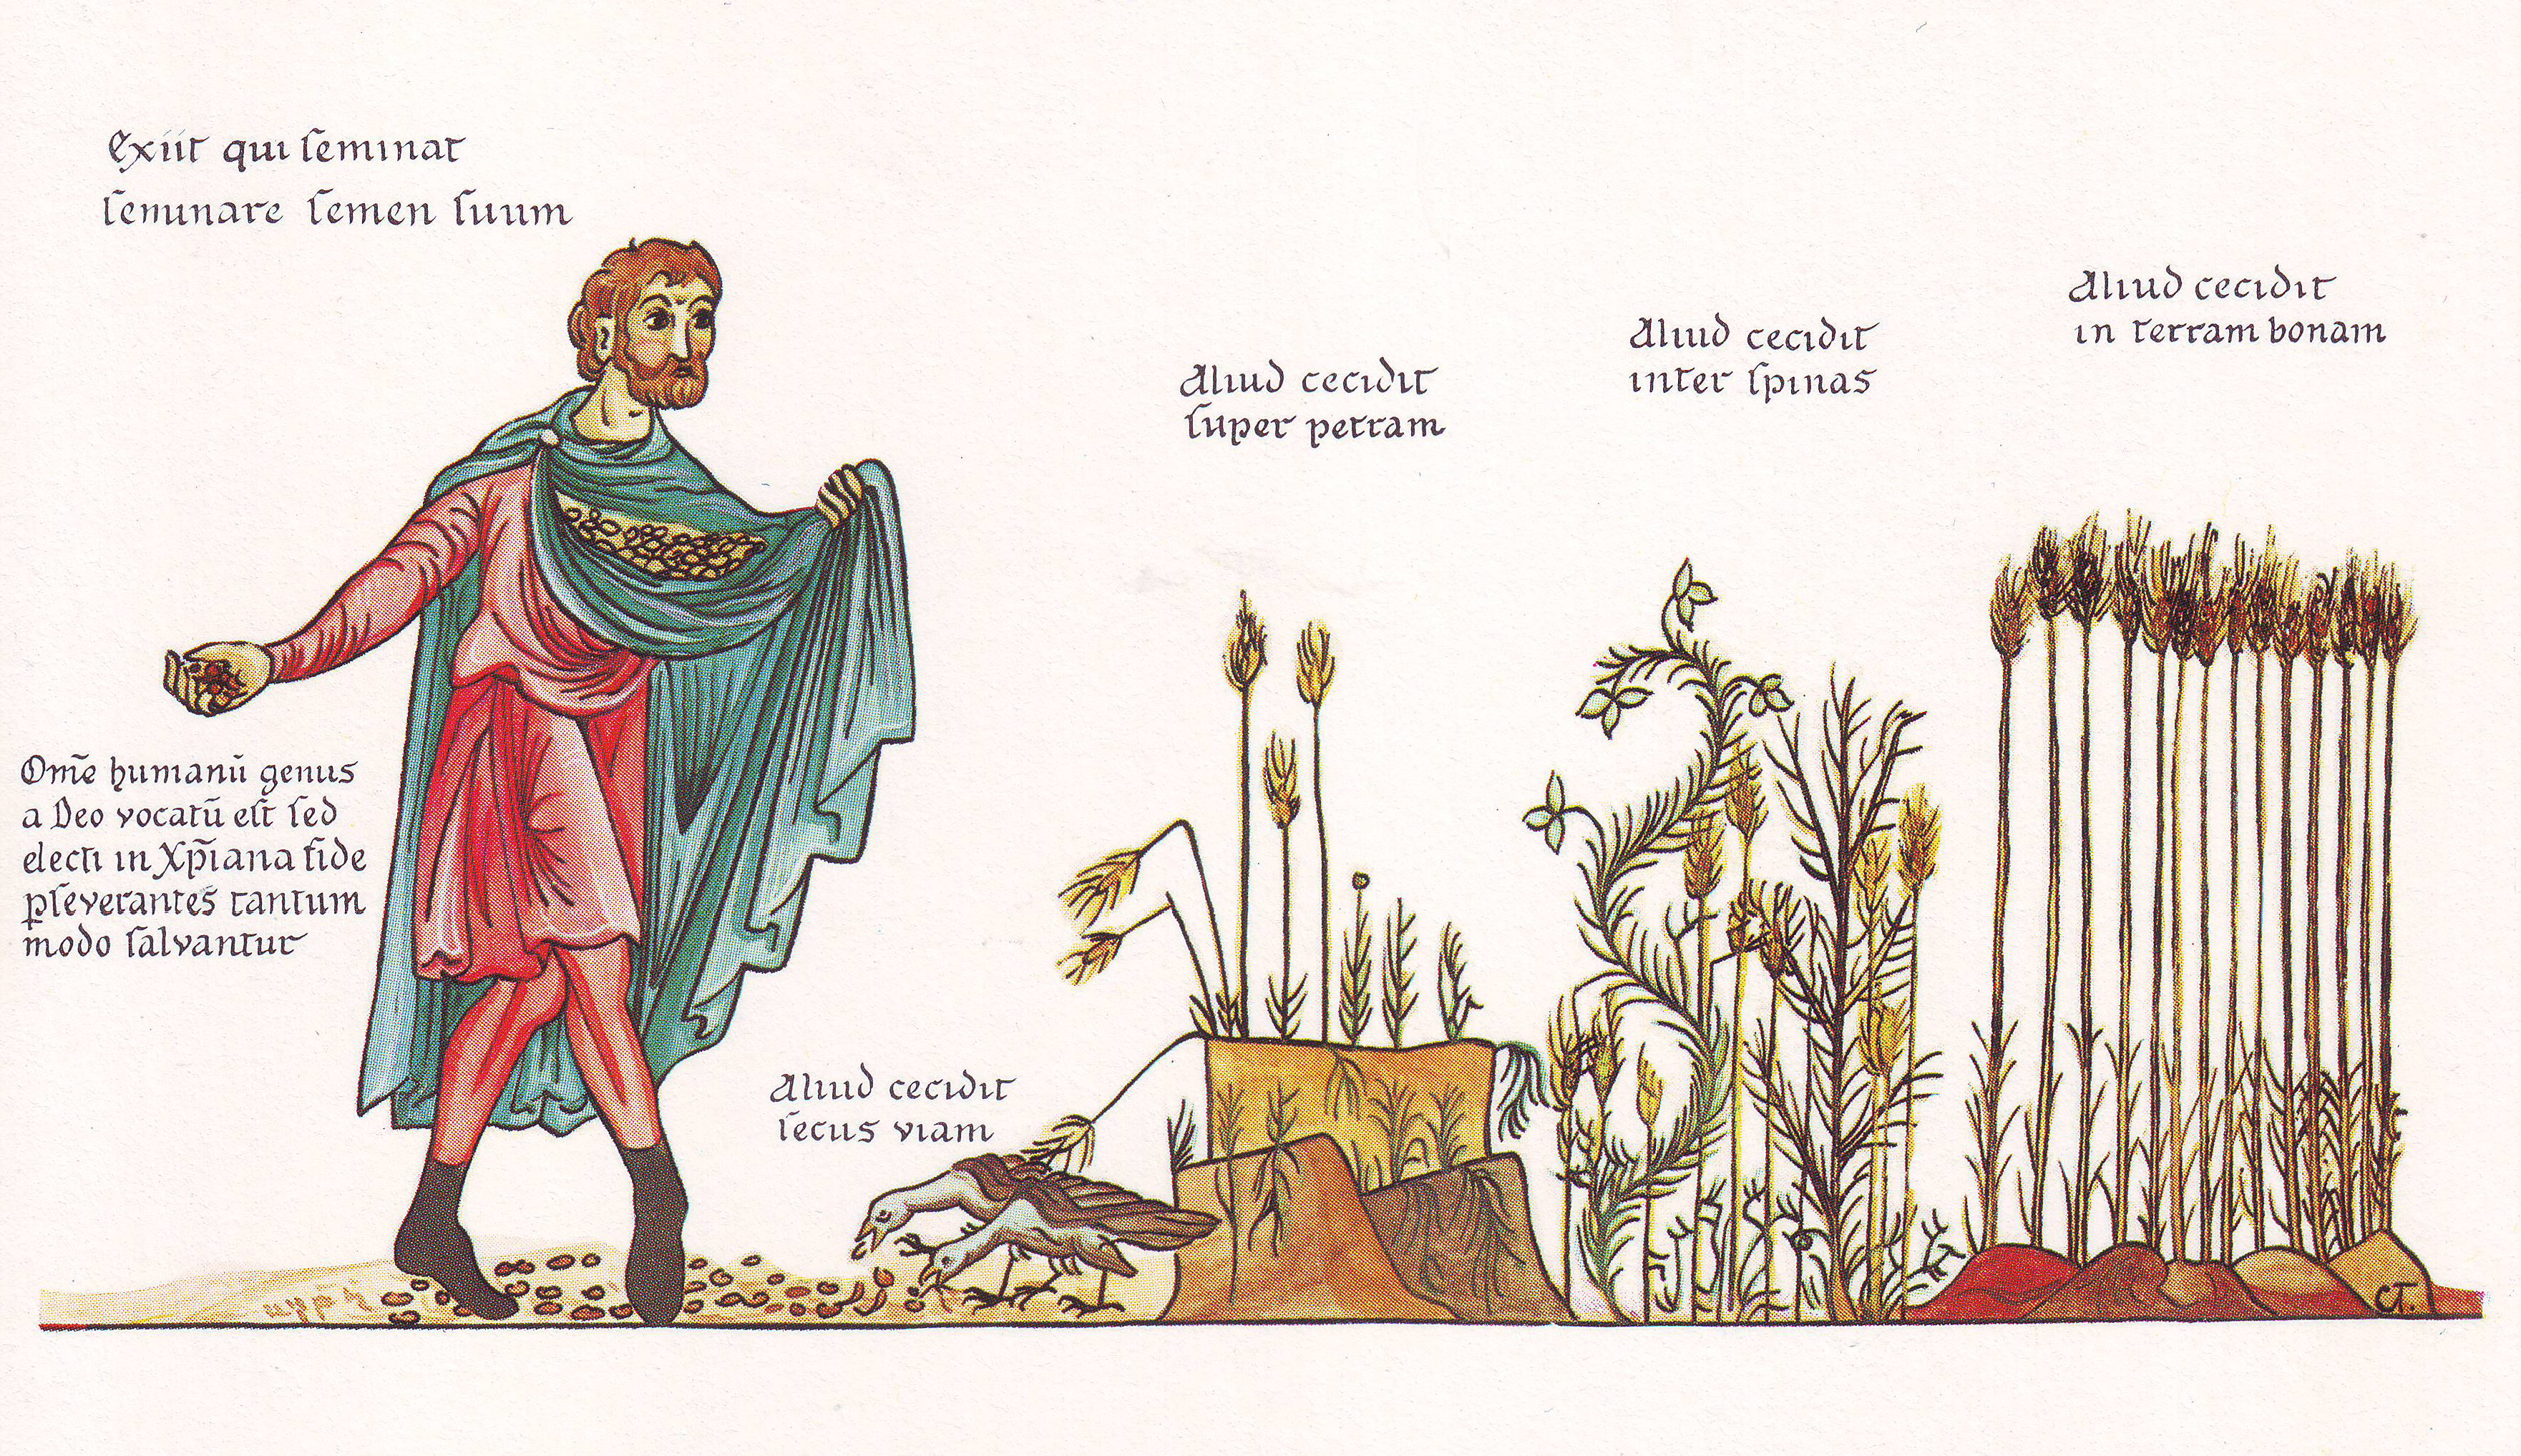 Parábola del sembrador - Wikipedia, la enciclopedia libre